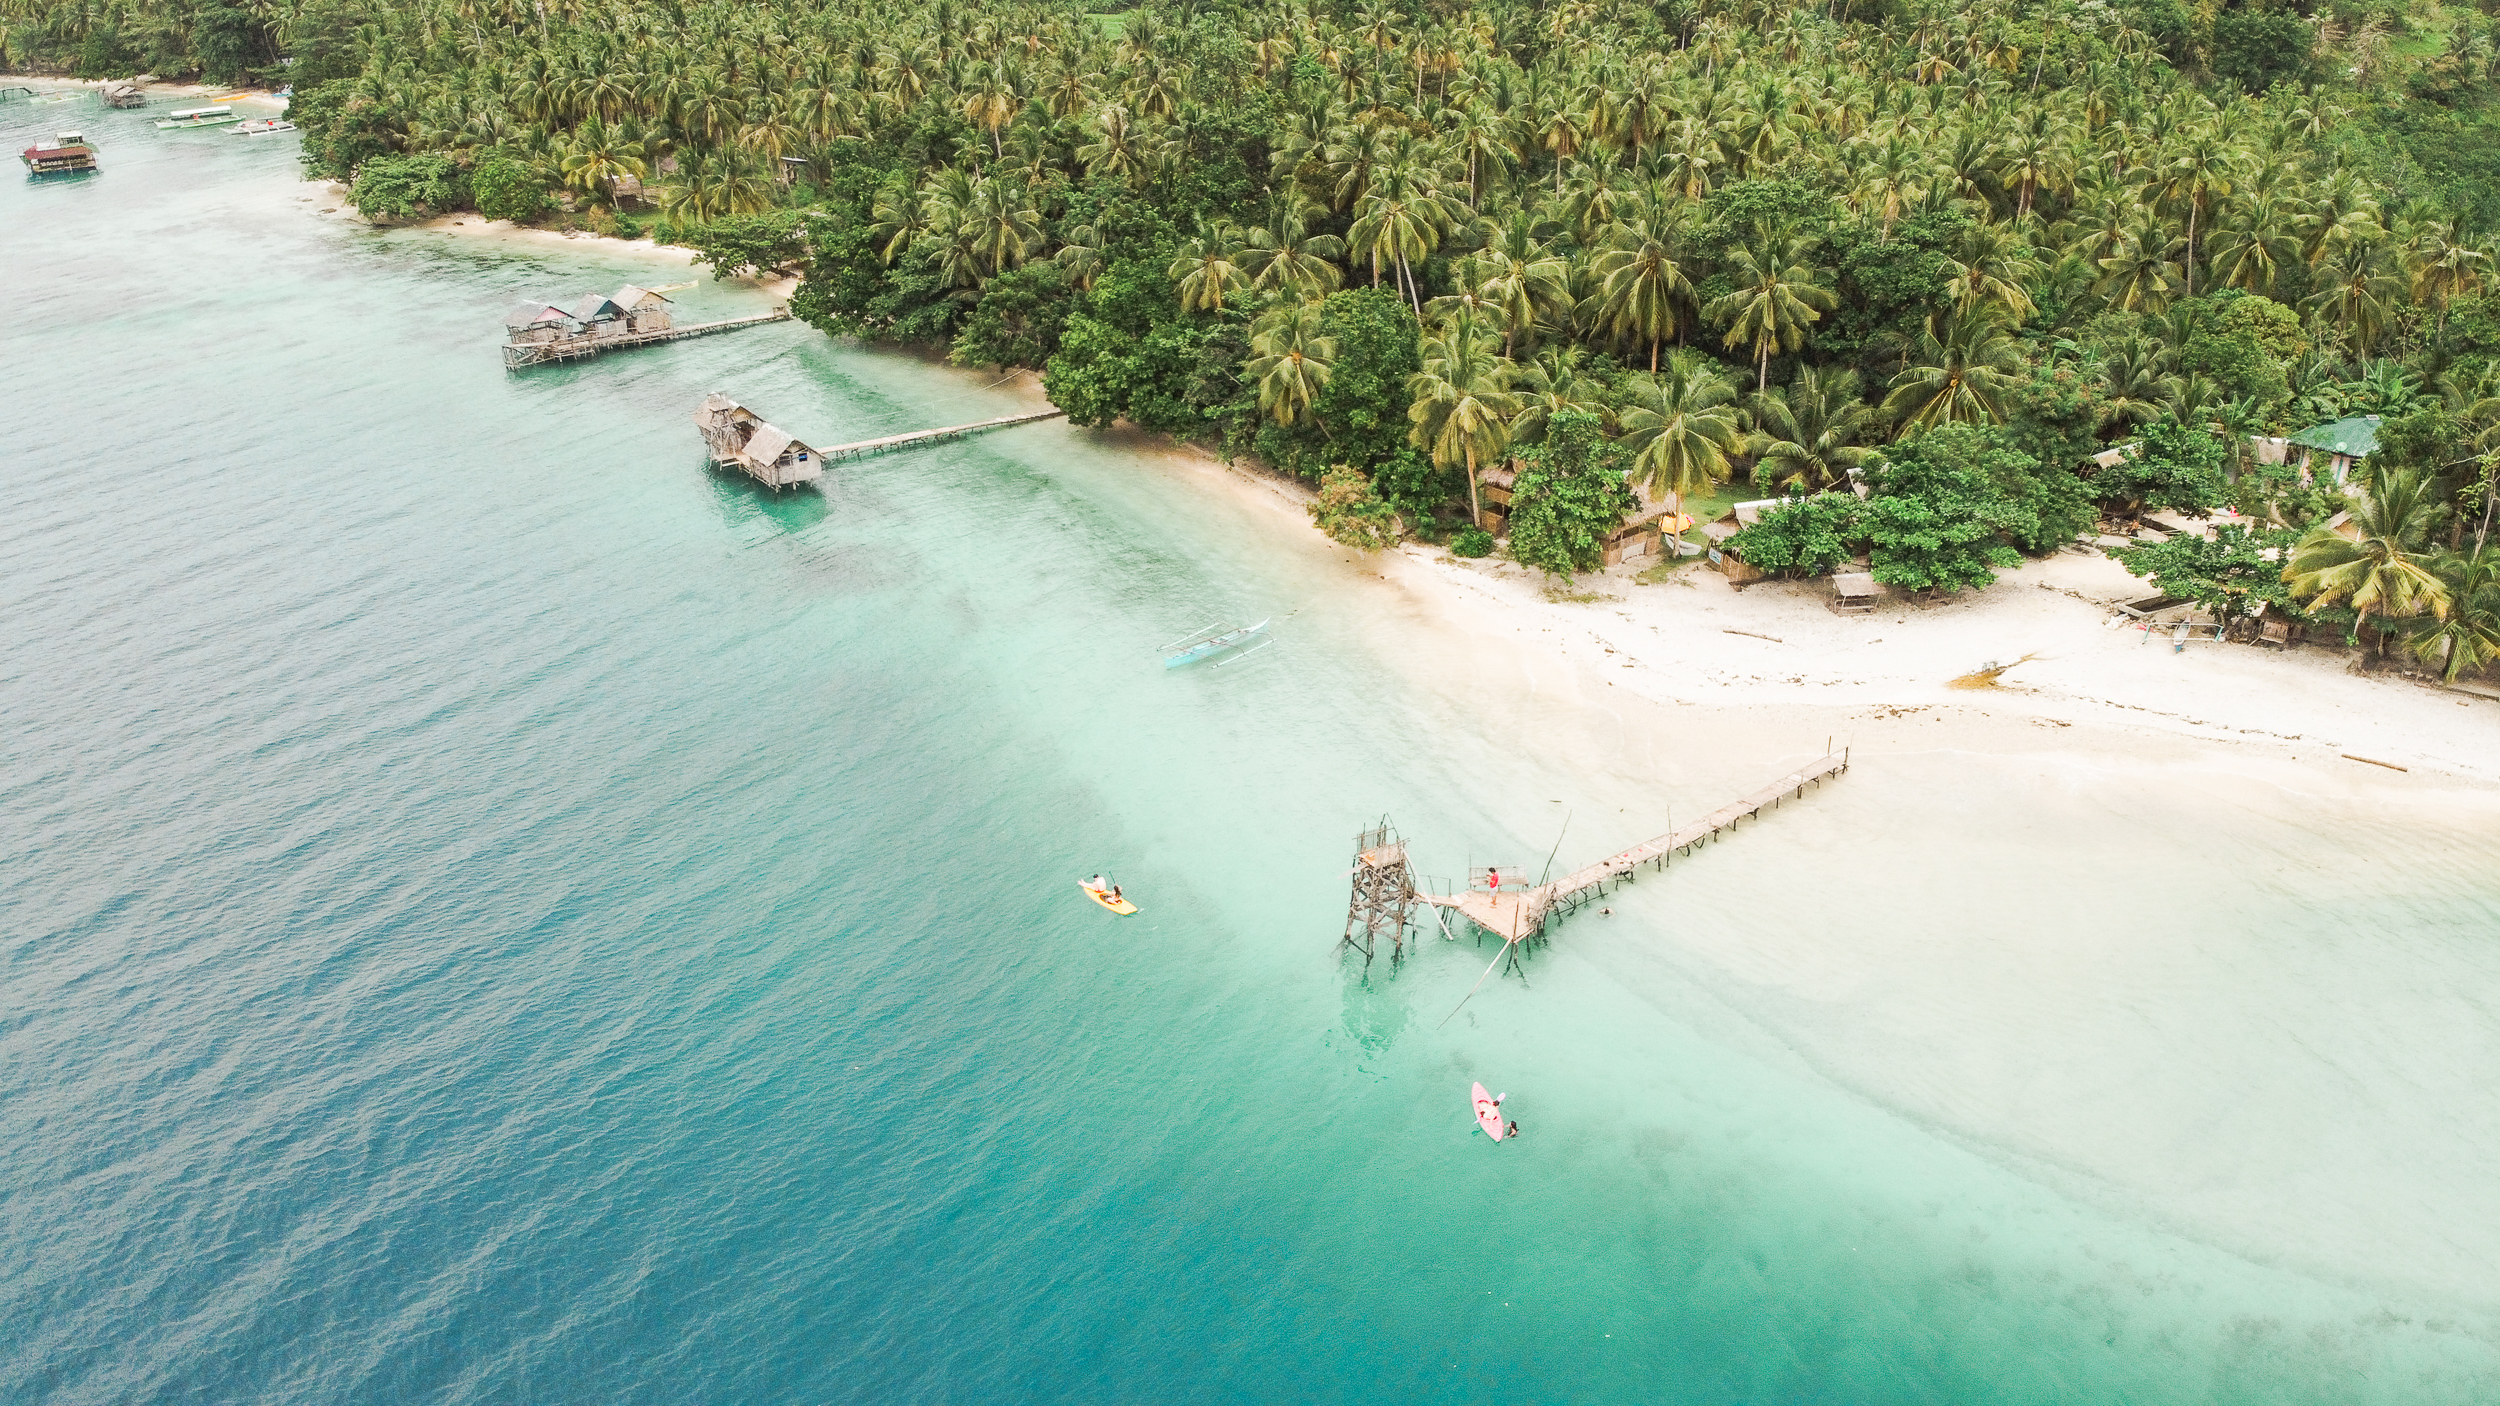 Leyte Hinunangan Twin Island Hopping Tour with Lunch & Transfers from Tacloban